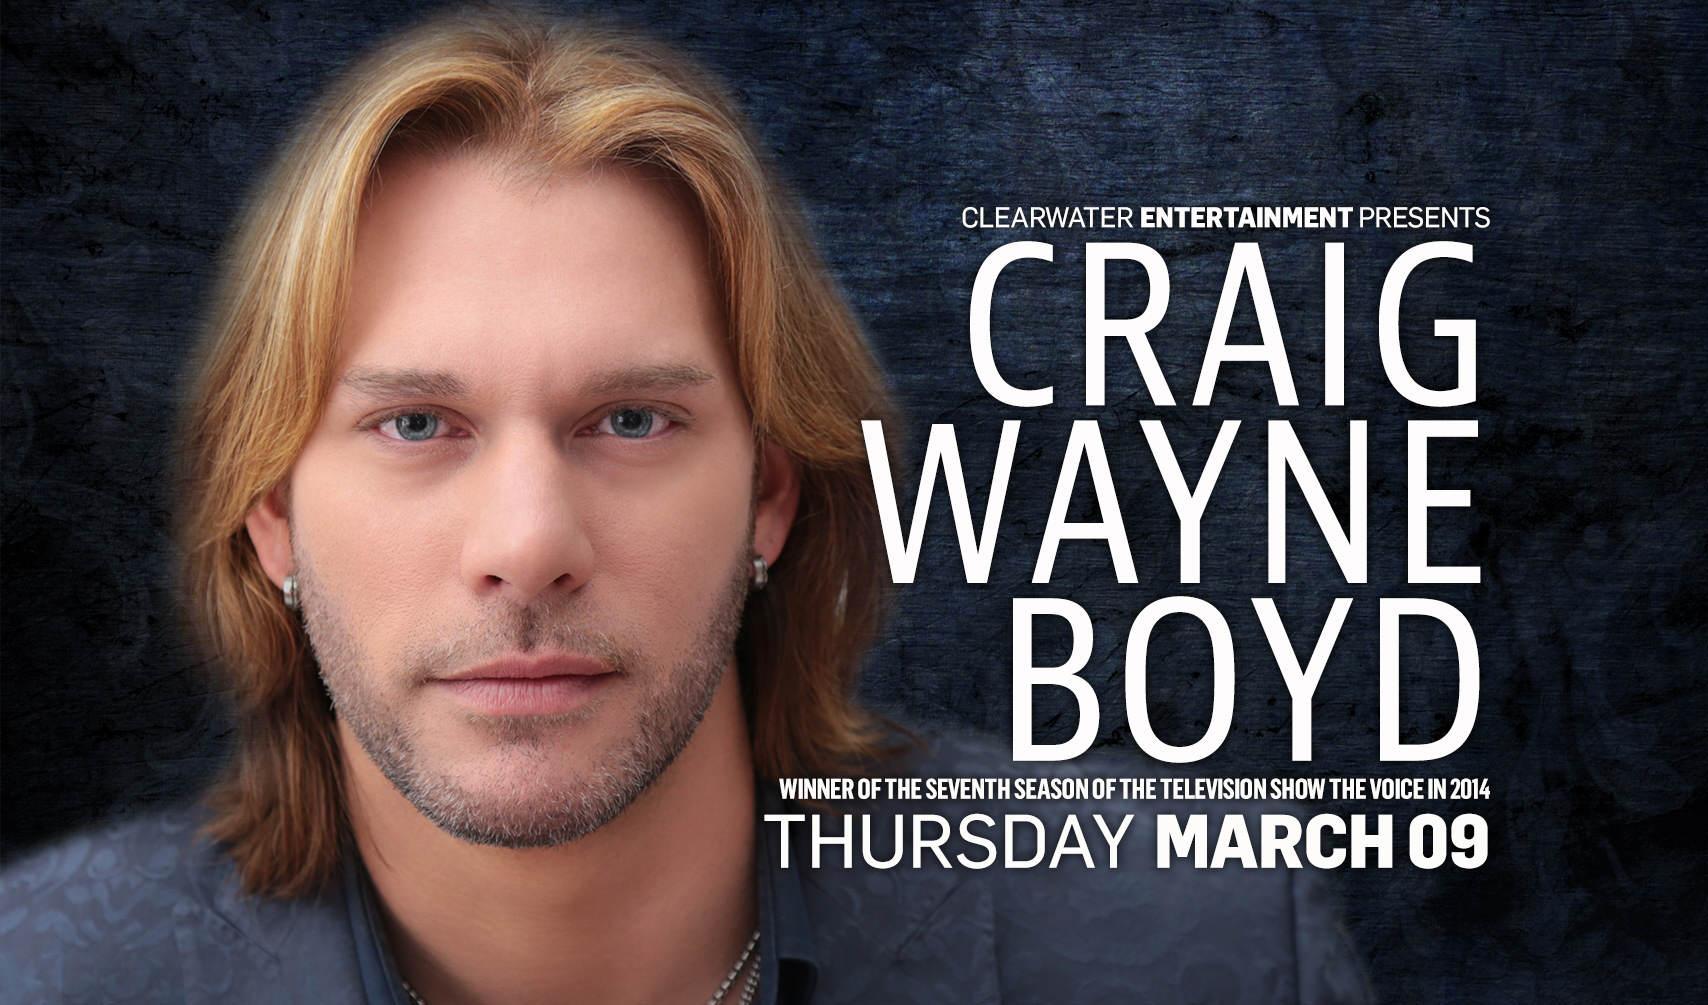 Clearwater Entertainment Presents: Craig Wayne Boyd